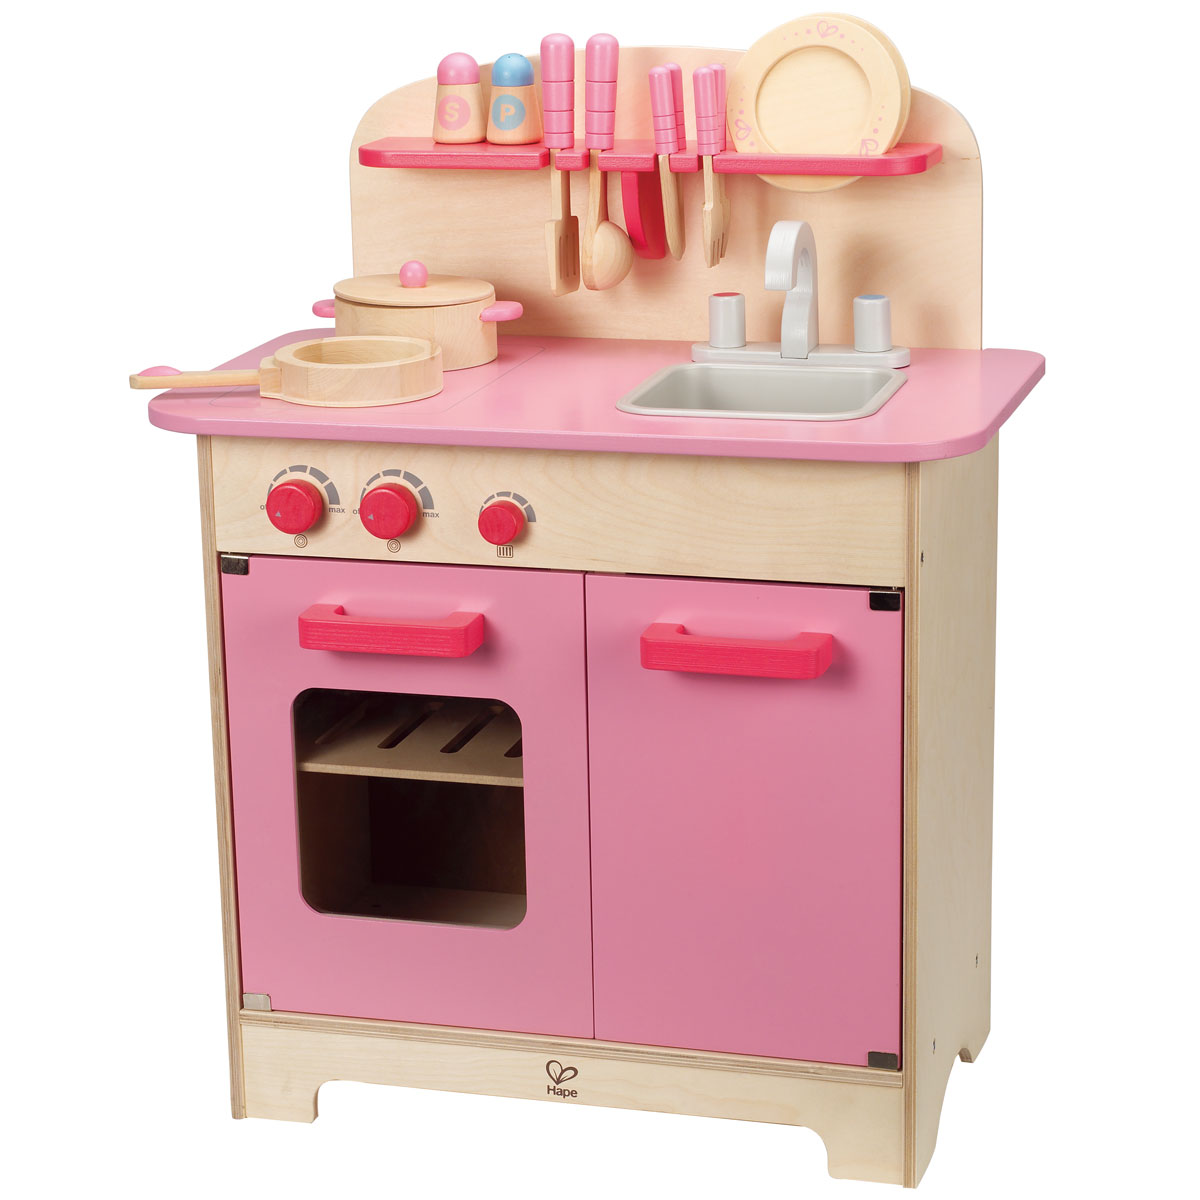 Garage En Bois Hape : Hape Gourmet Kitchen